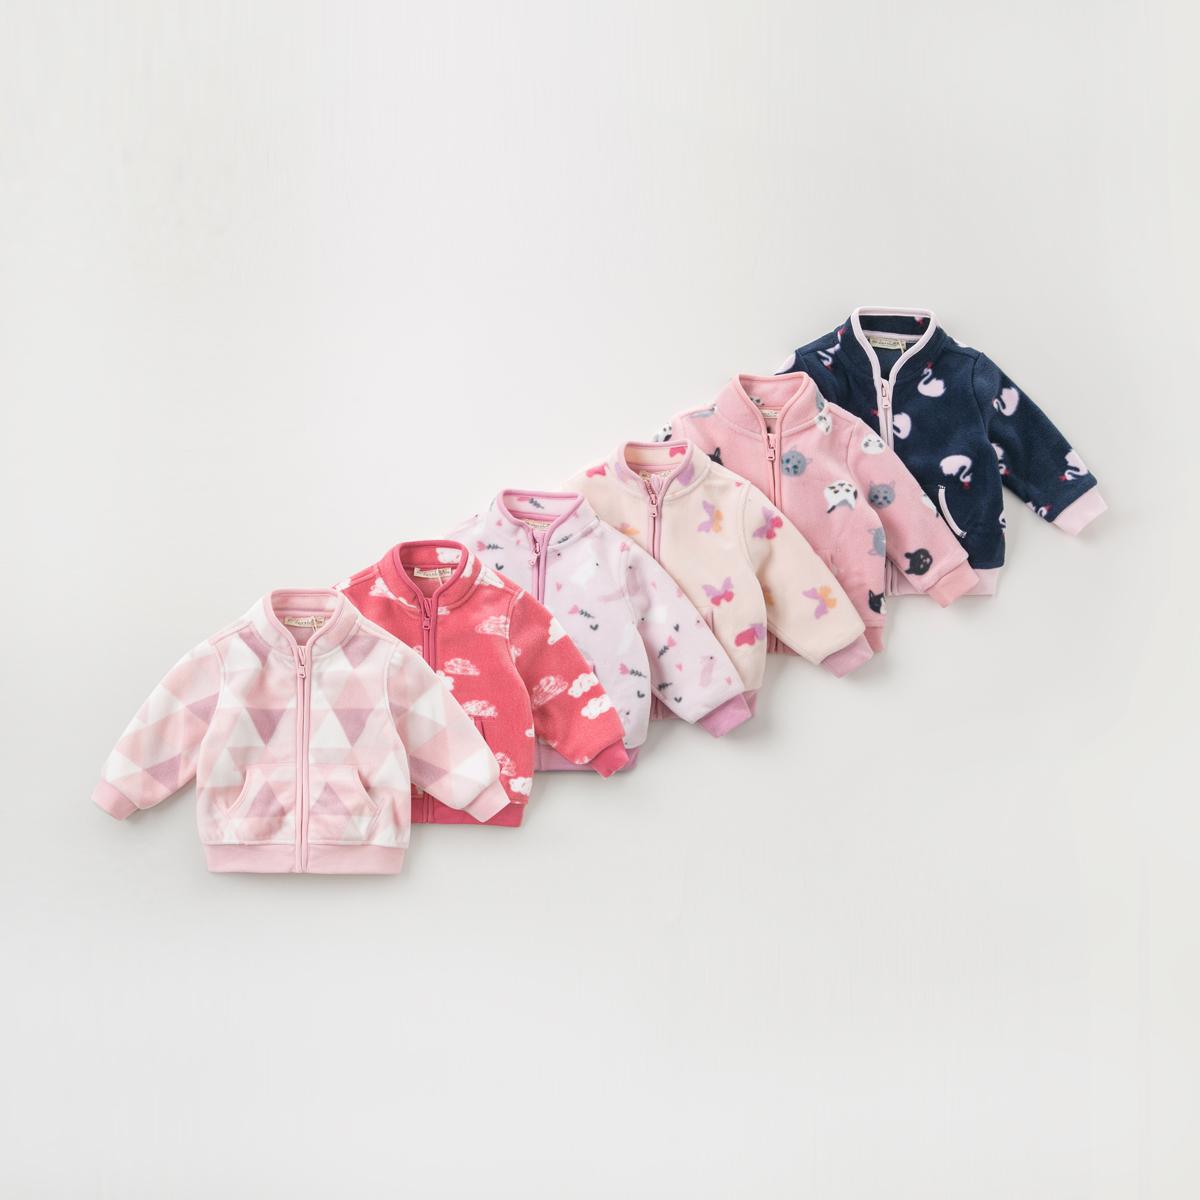 davebella戴维贝拉秋装女童外套新款童装婴儿洋气夹克上衣DB396